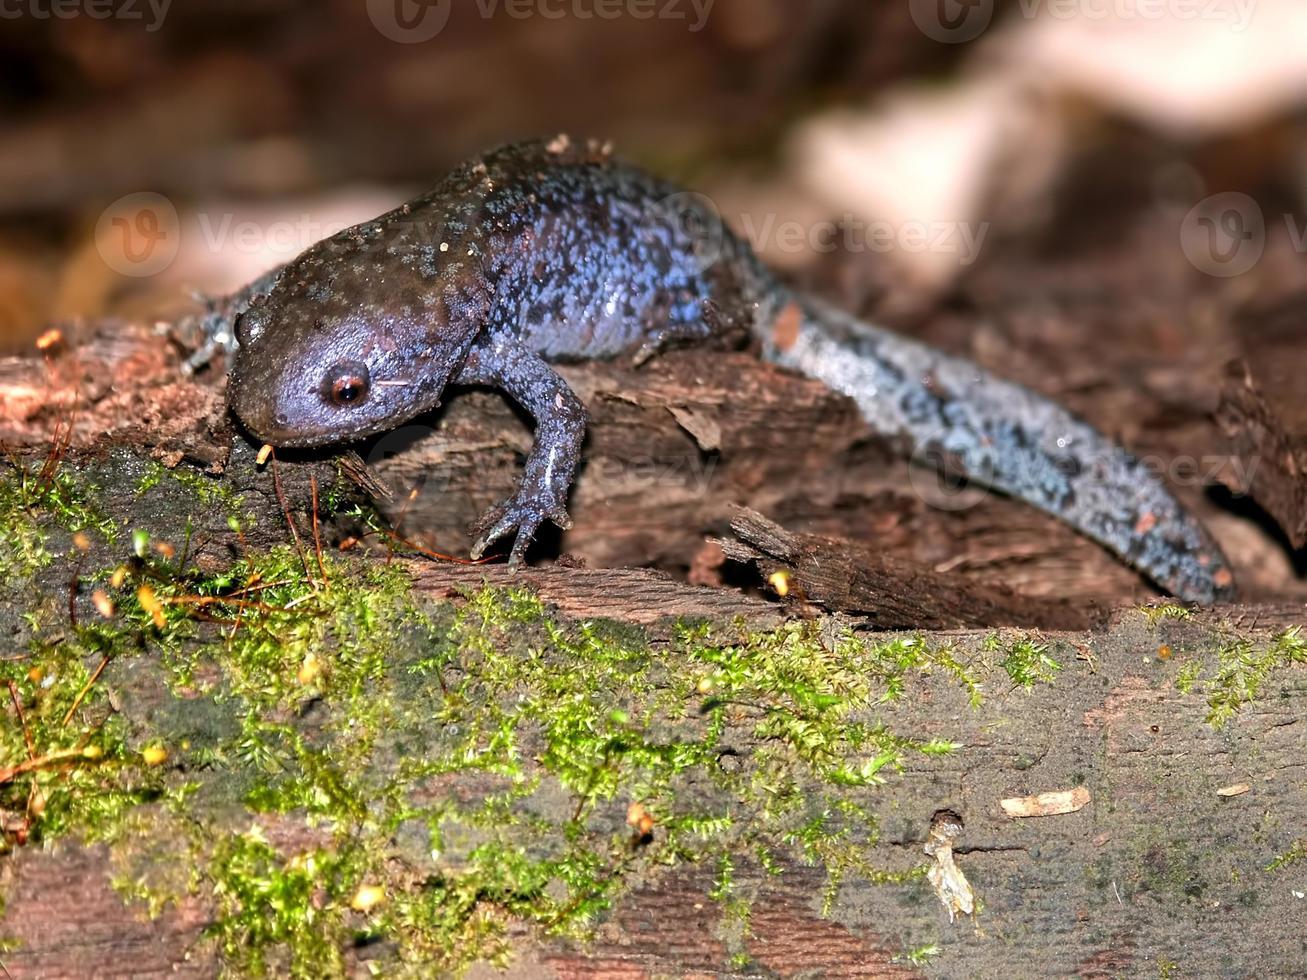 mol salamander in Illinois foto